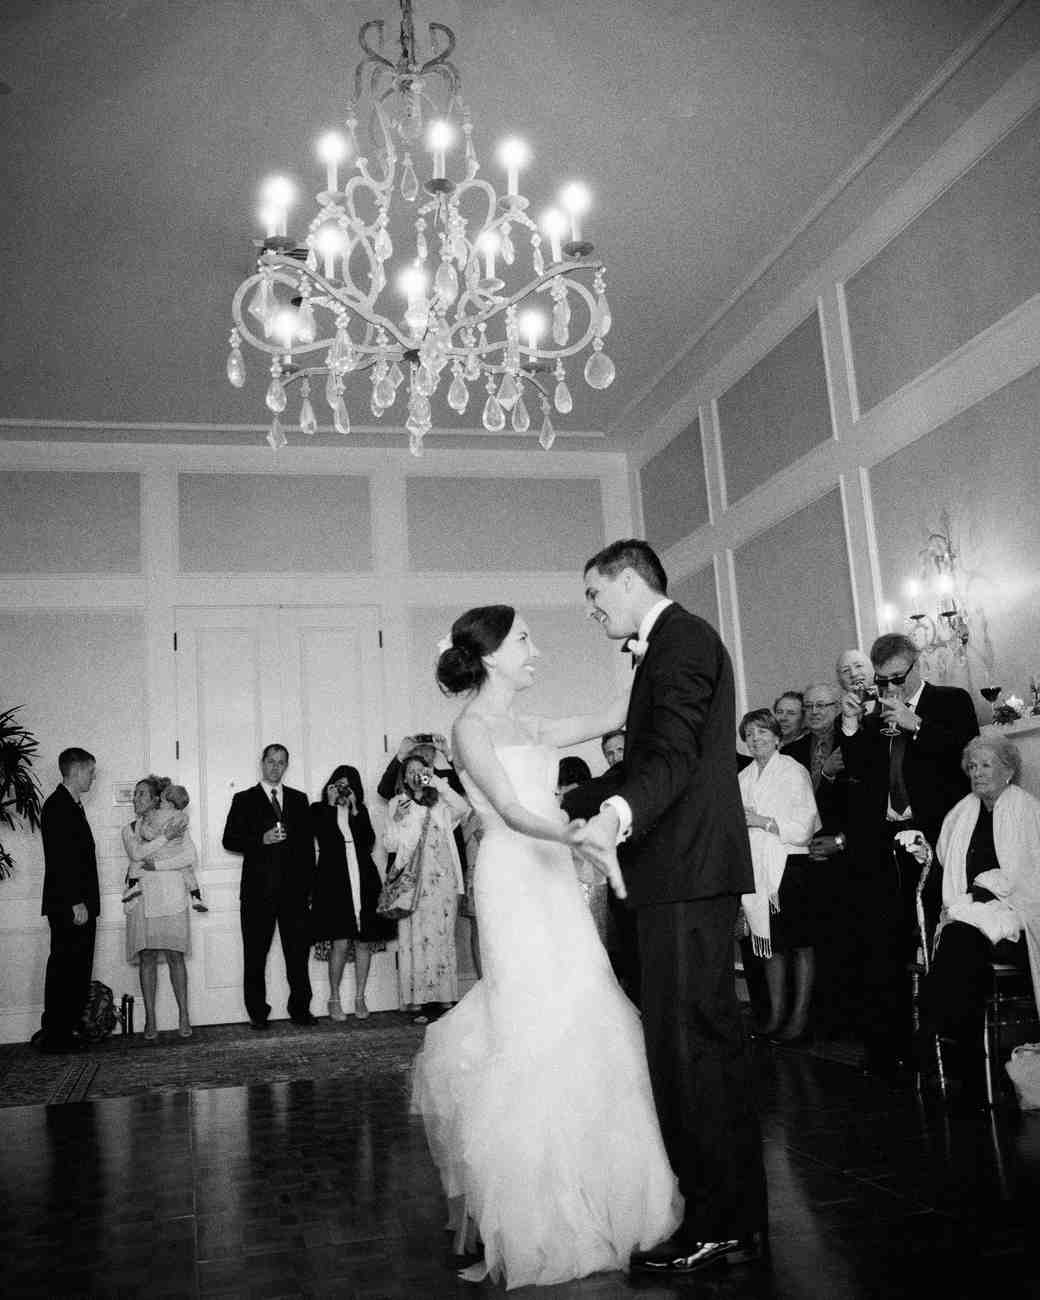 marwa-peter-wedding-firstdance-0414.jpg